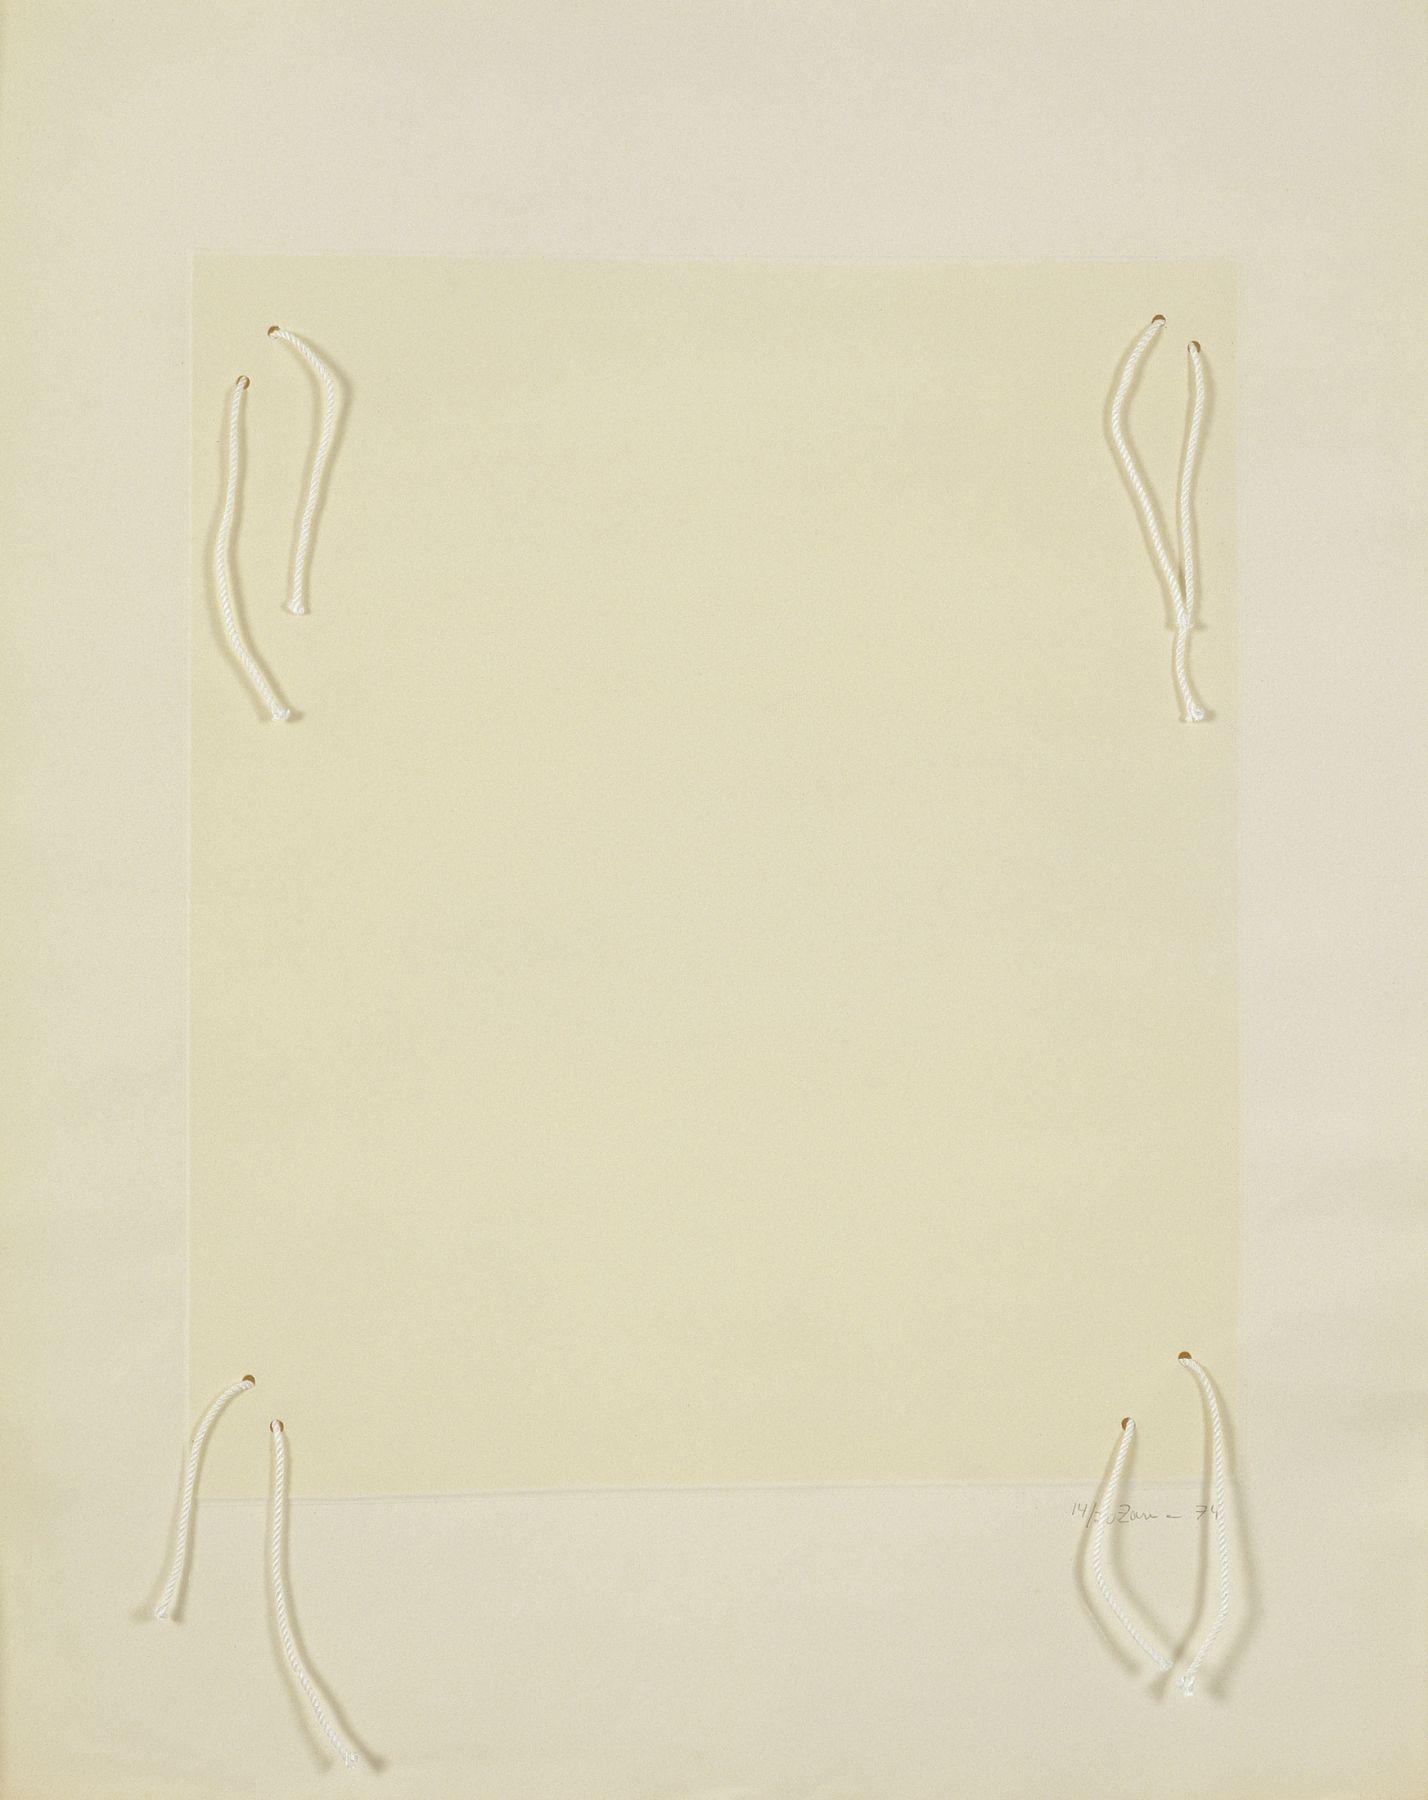 Zarina, Untitled, 1974